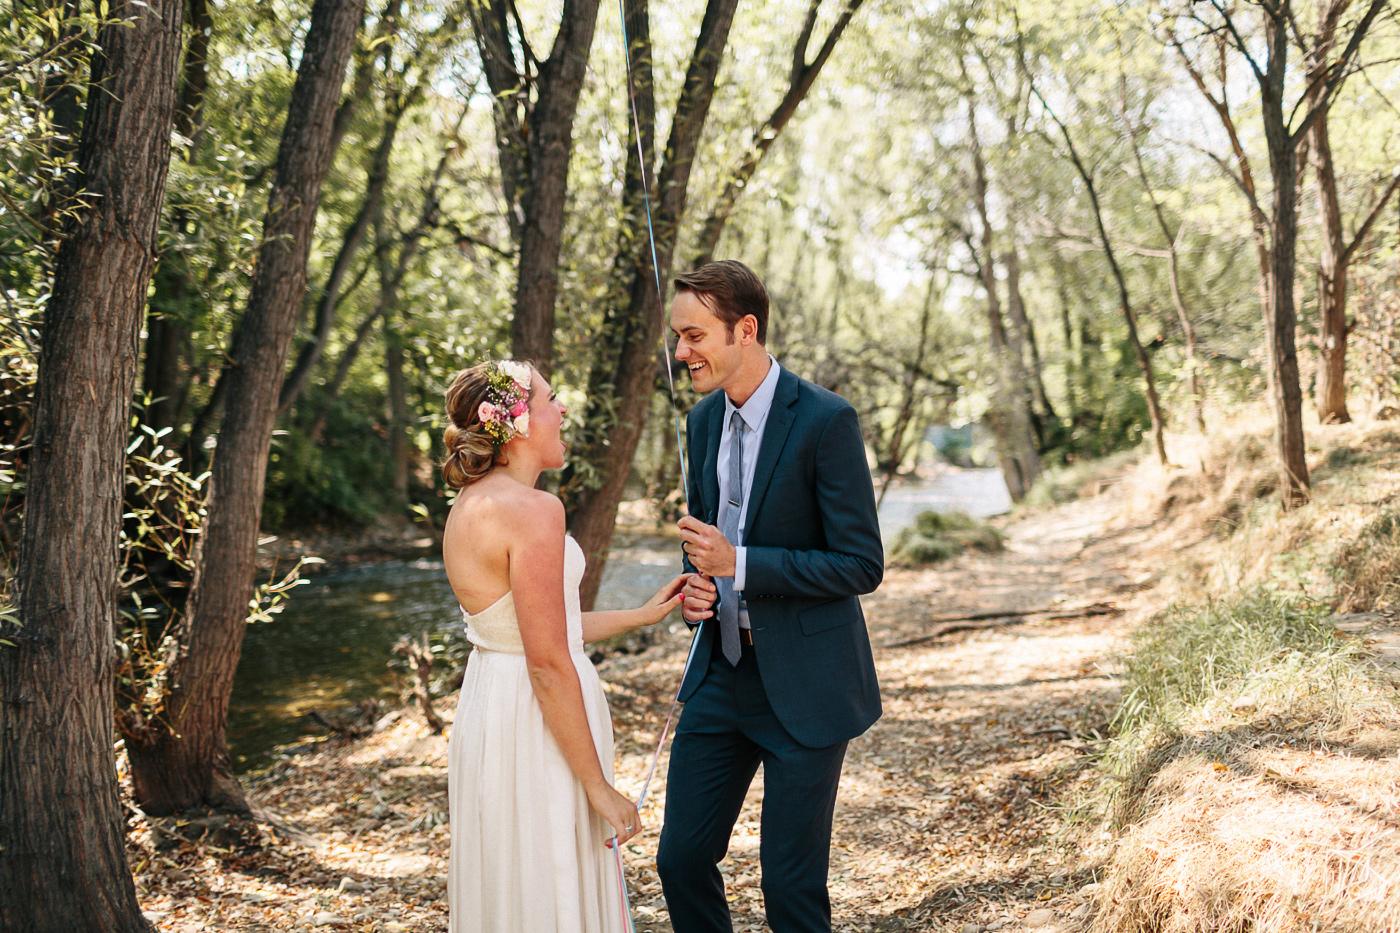 Lyons-Farmette-Wedding-Photographer-Lucy-Austin-Flash-Mob-Dance-9.jpg